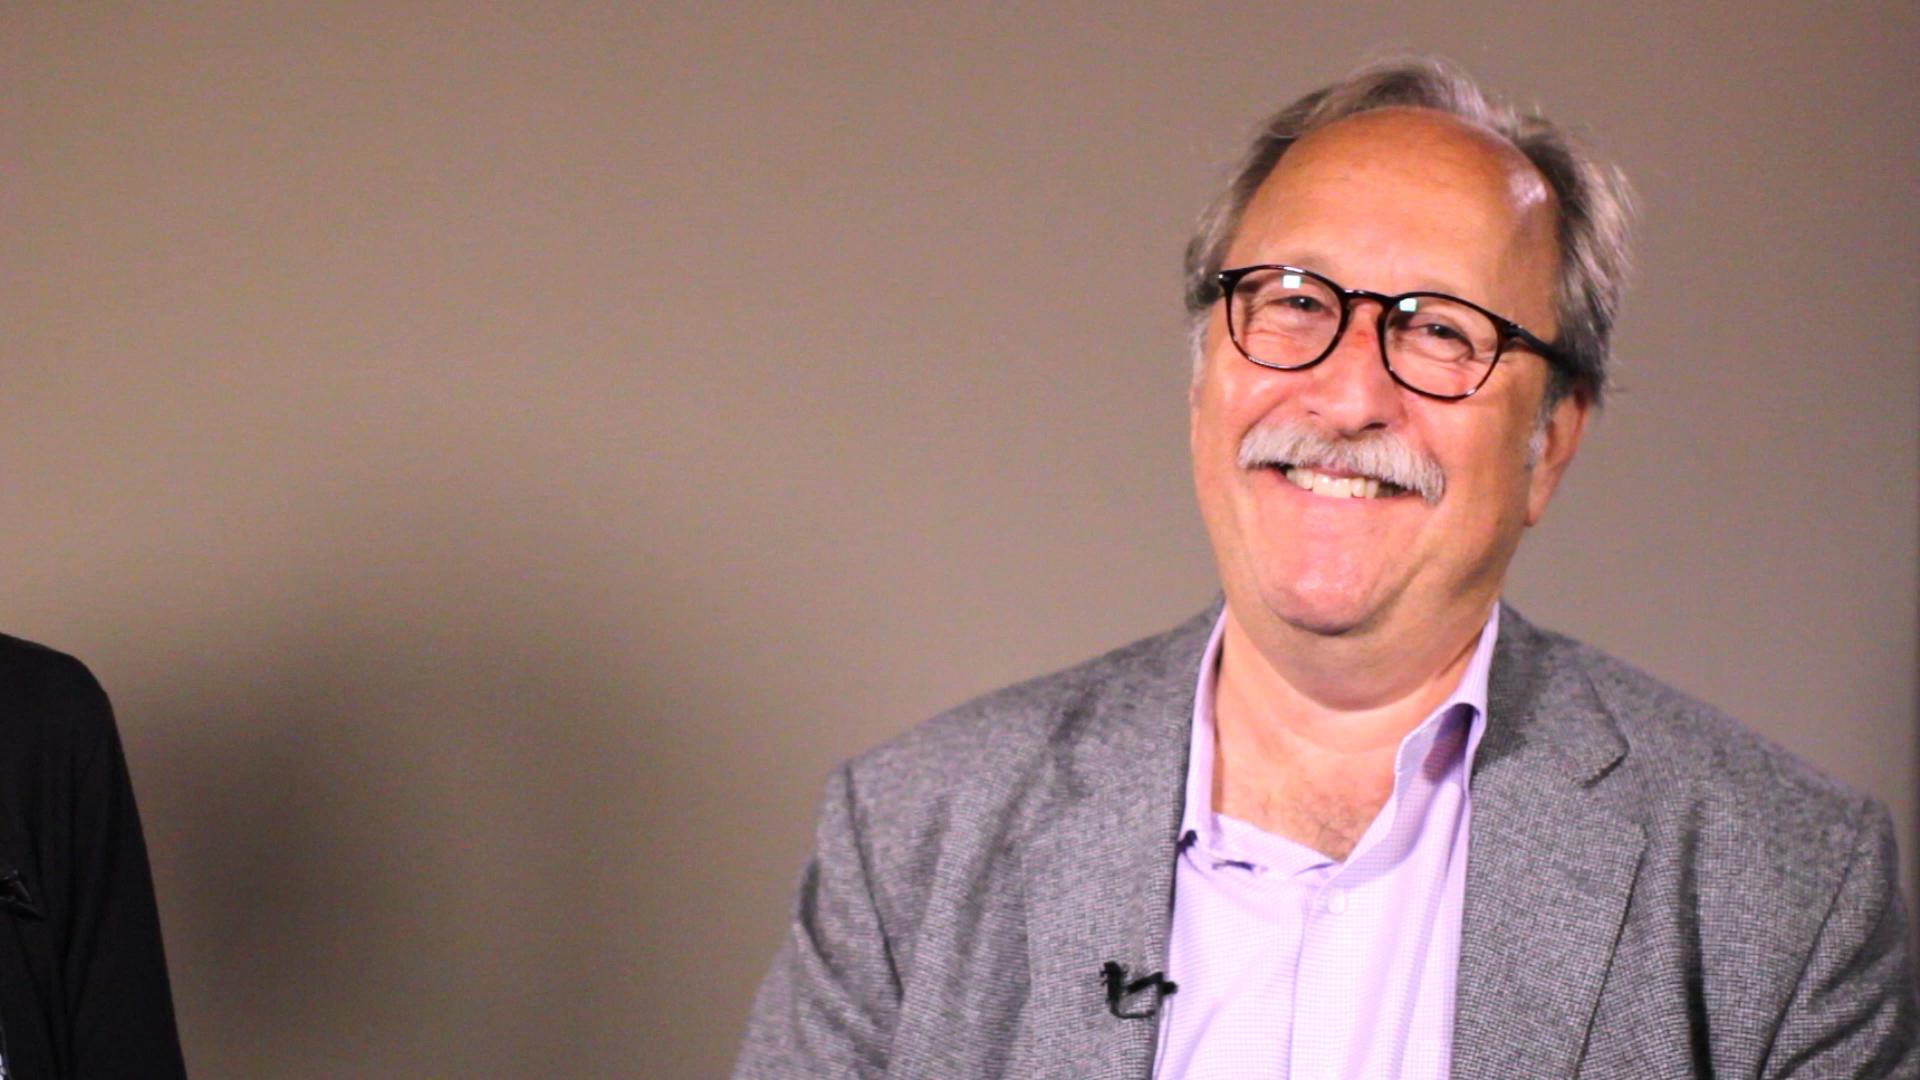 Cary Sherburne and David Zwang Talk drupa News from Konica Minolta, Kodak, Heidelberg's Big Data Initiative